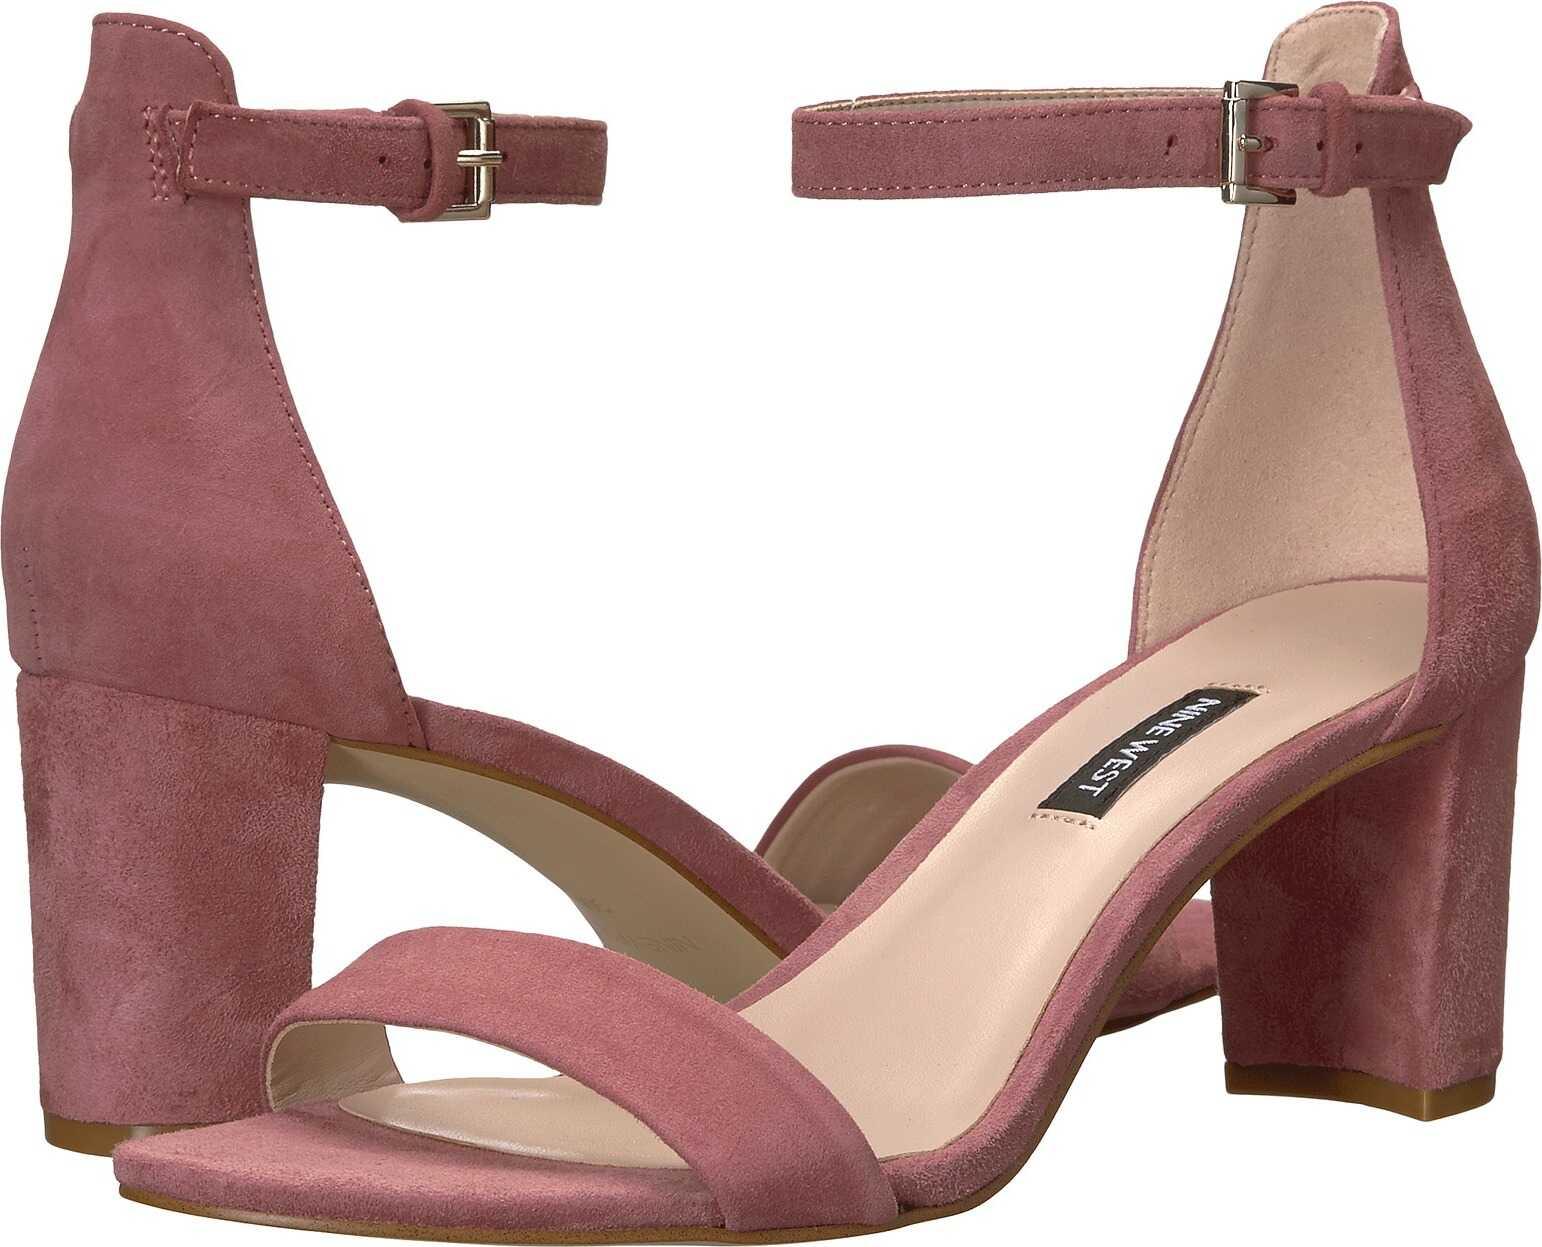 Nine West Pruce Block Heel Sandal Peony